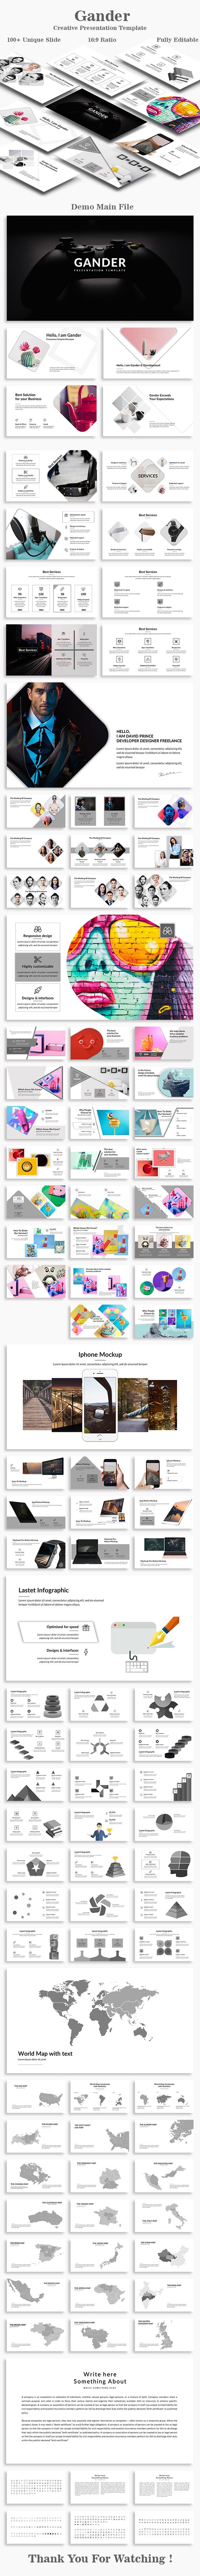 Gander Creative PowerPoint Template - Creative PowerPoint Templates